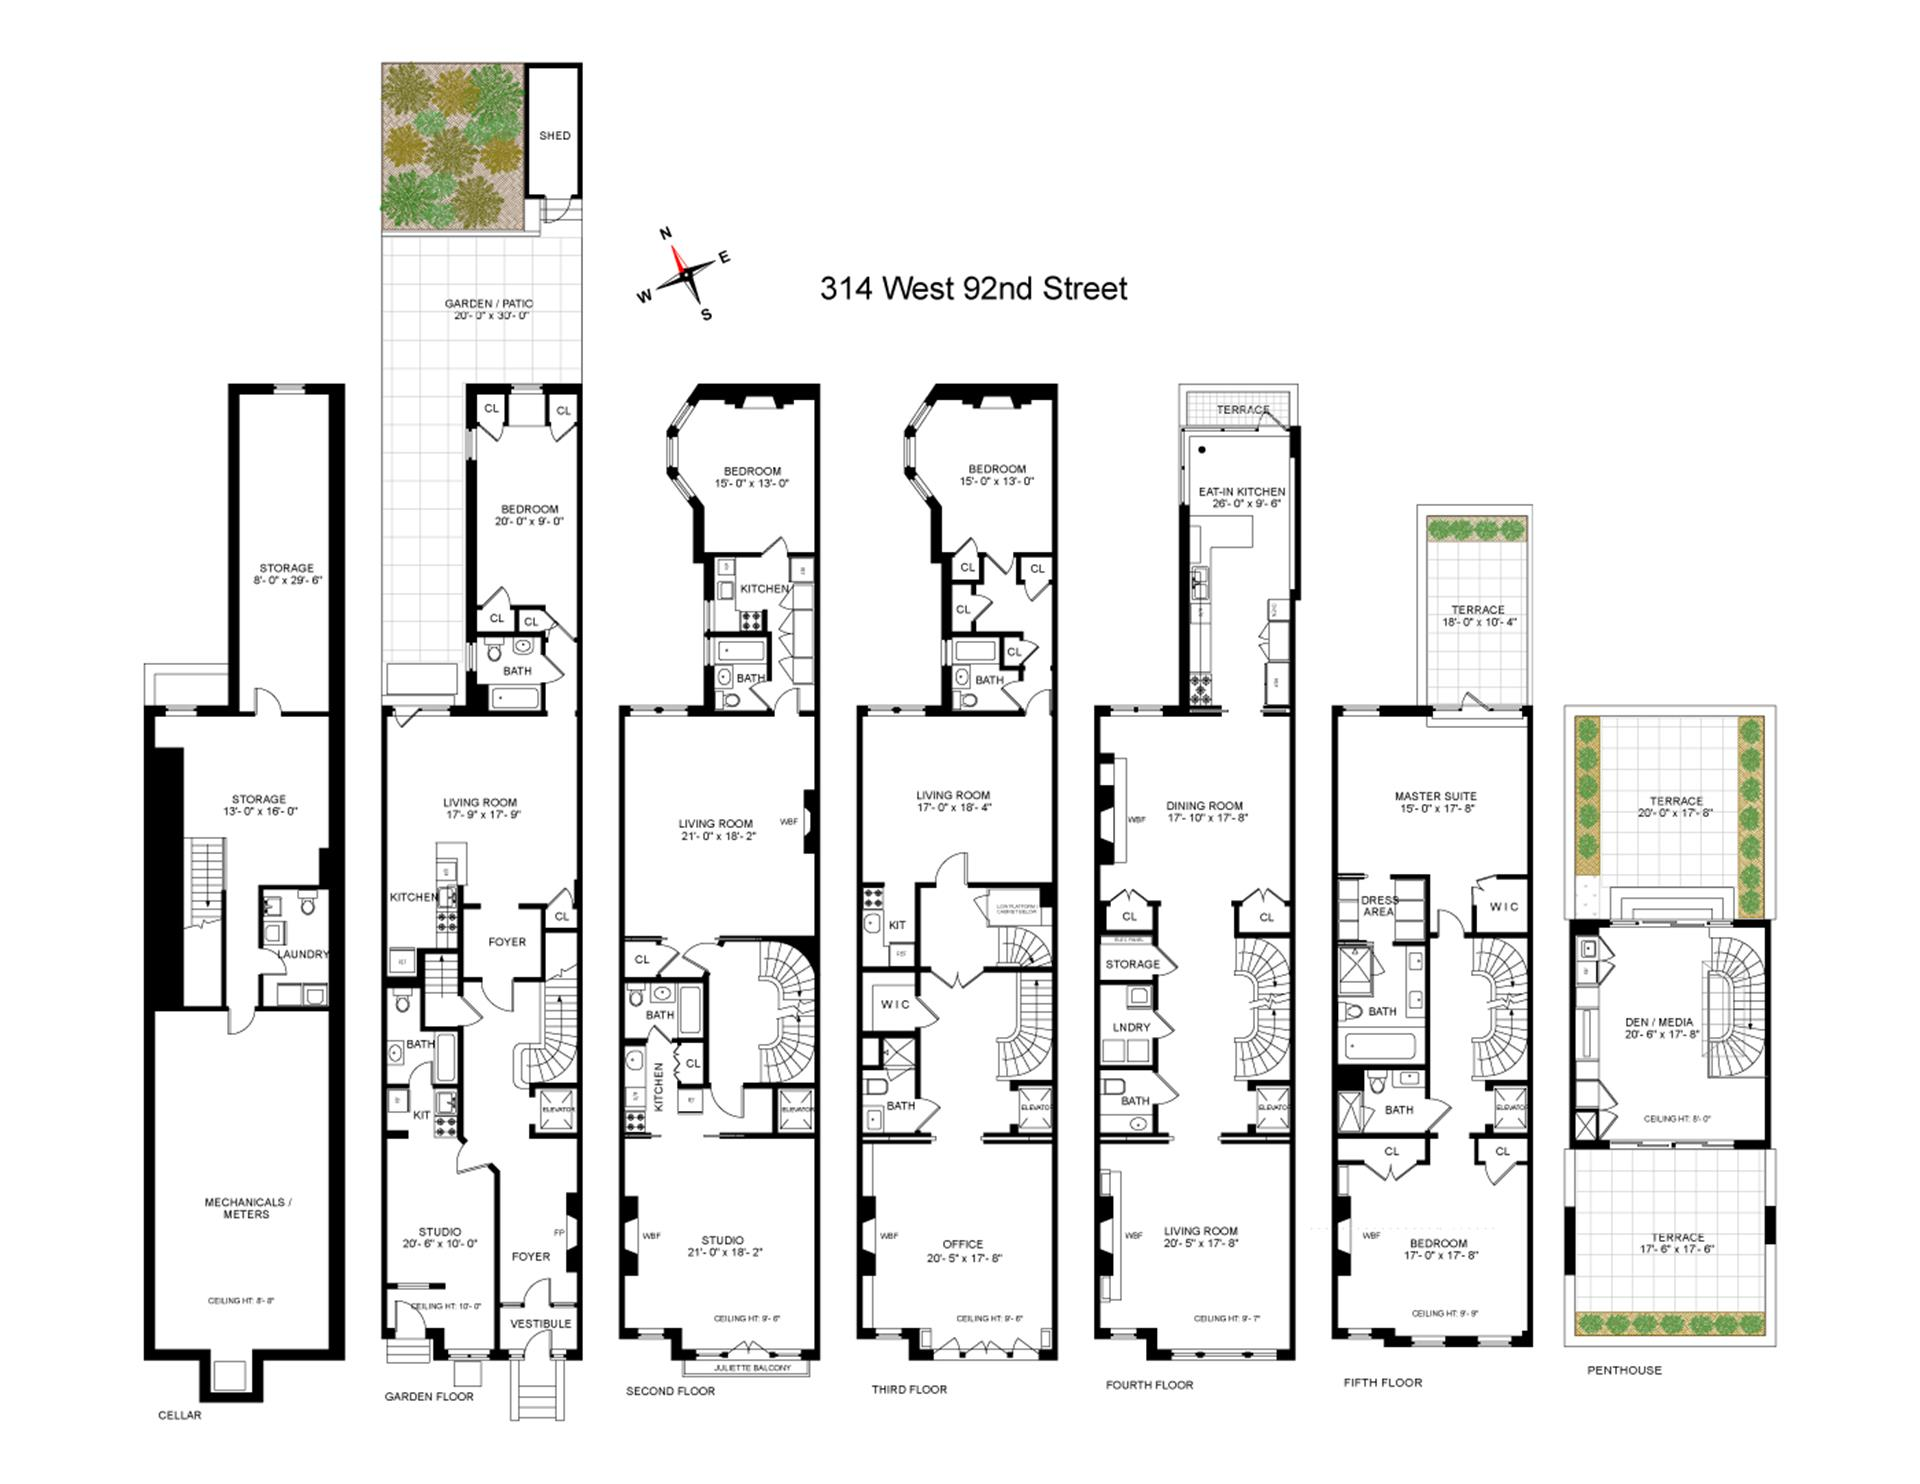 Floor plan of 314 West 92nd St - Upper West Side, New York